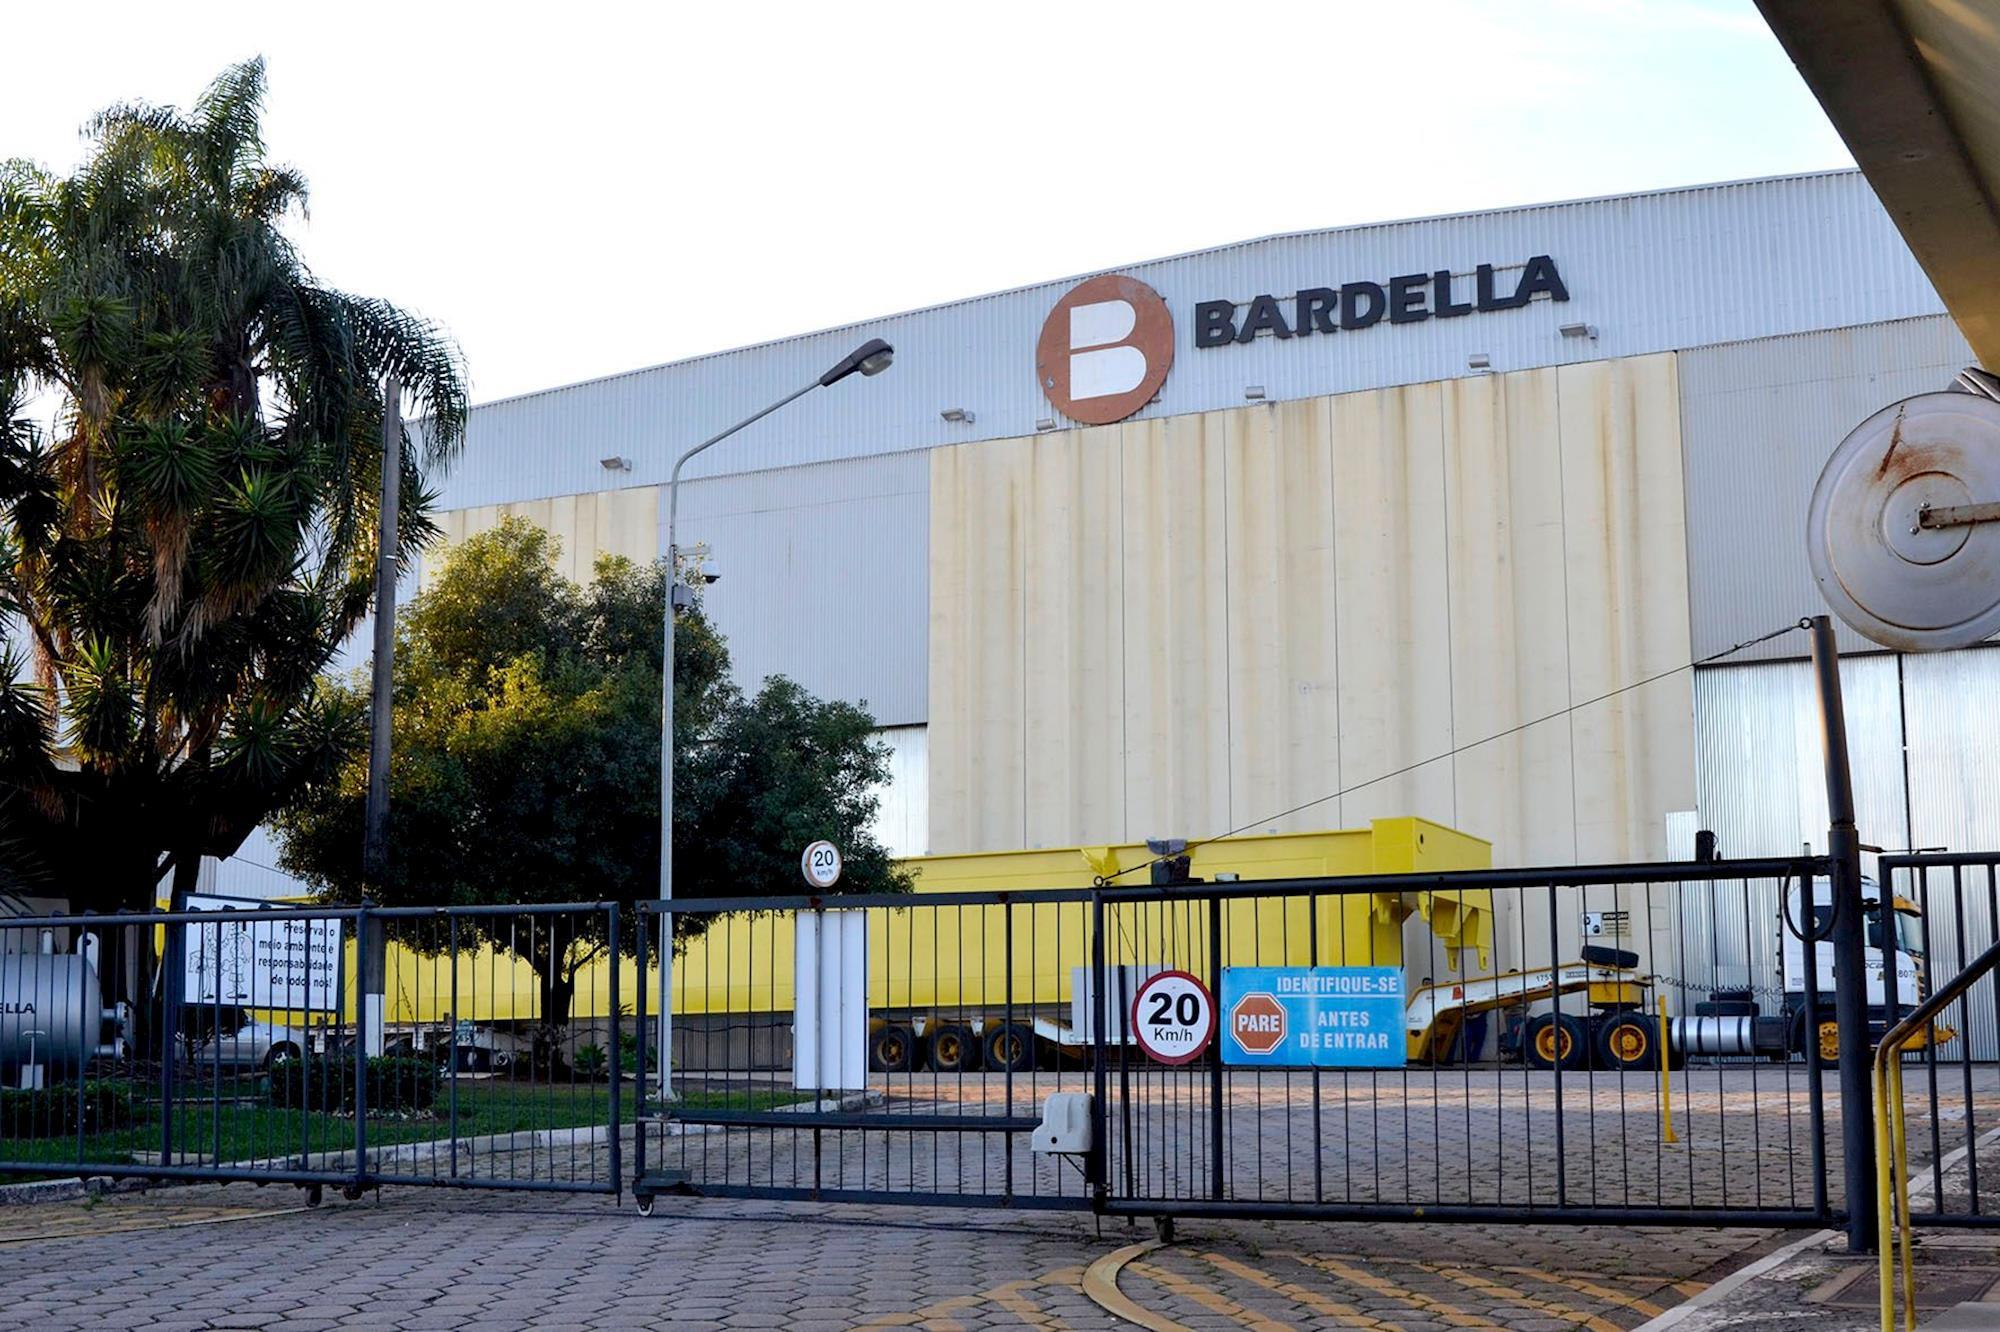 bardella, araras, duraferro, greve, Foguinho/Imprensa SMetal